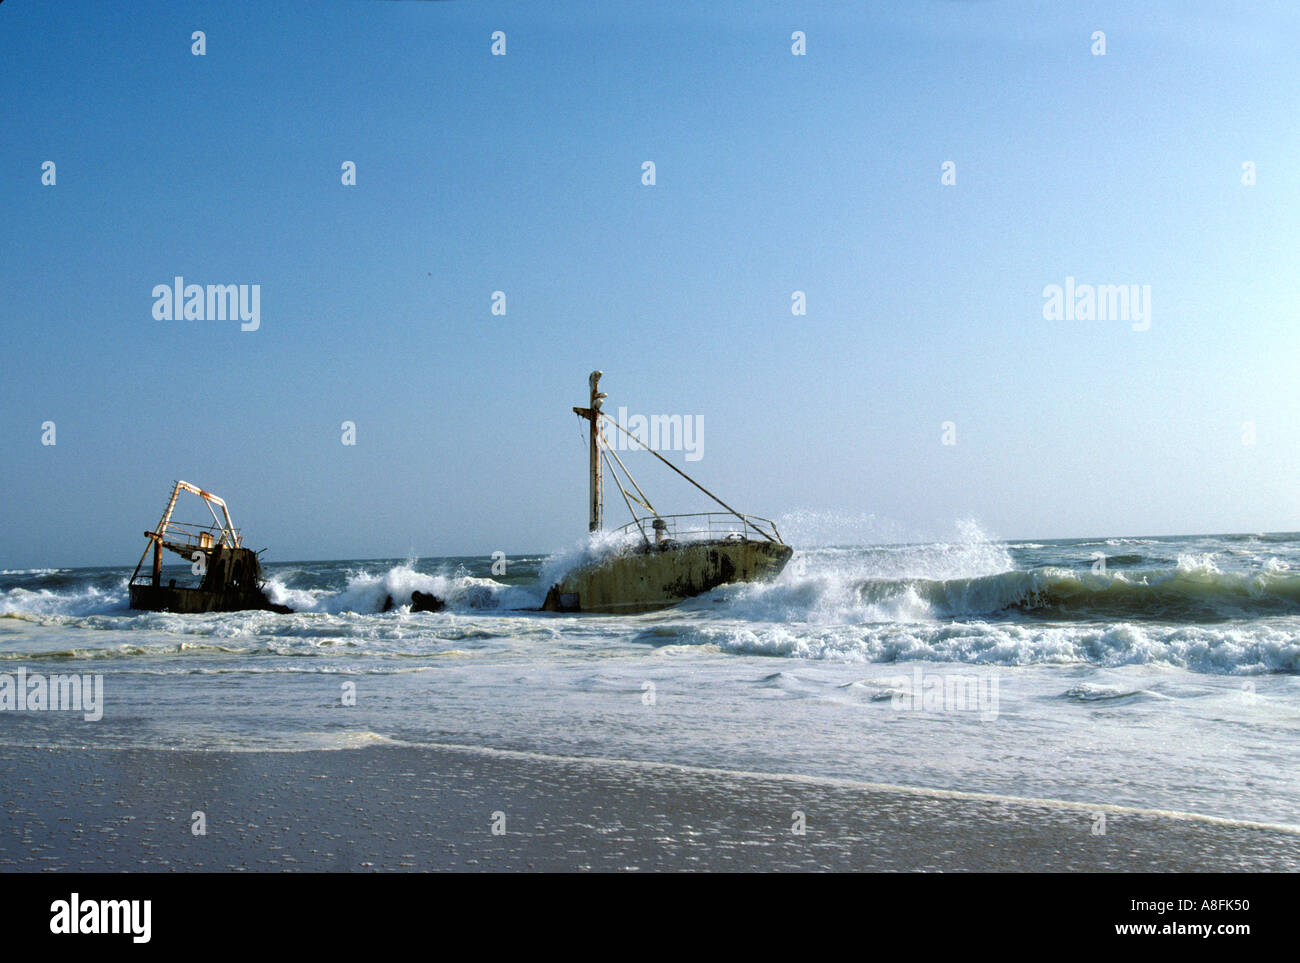 shipwreck on the Skeleton Coast Namibia - Stock Image